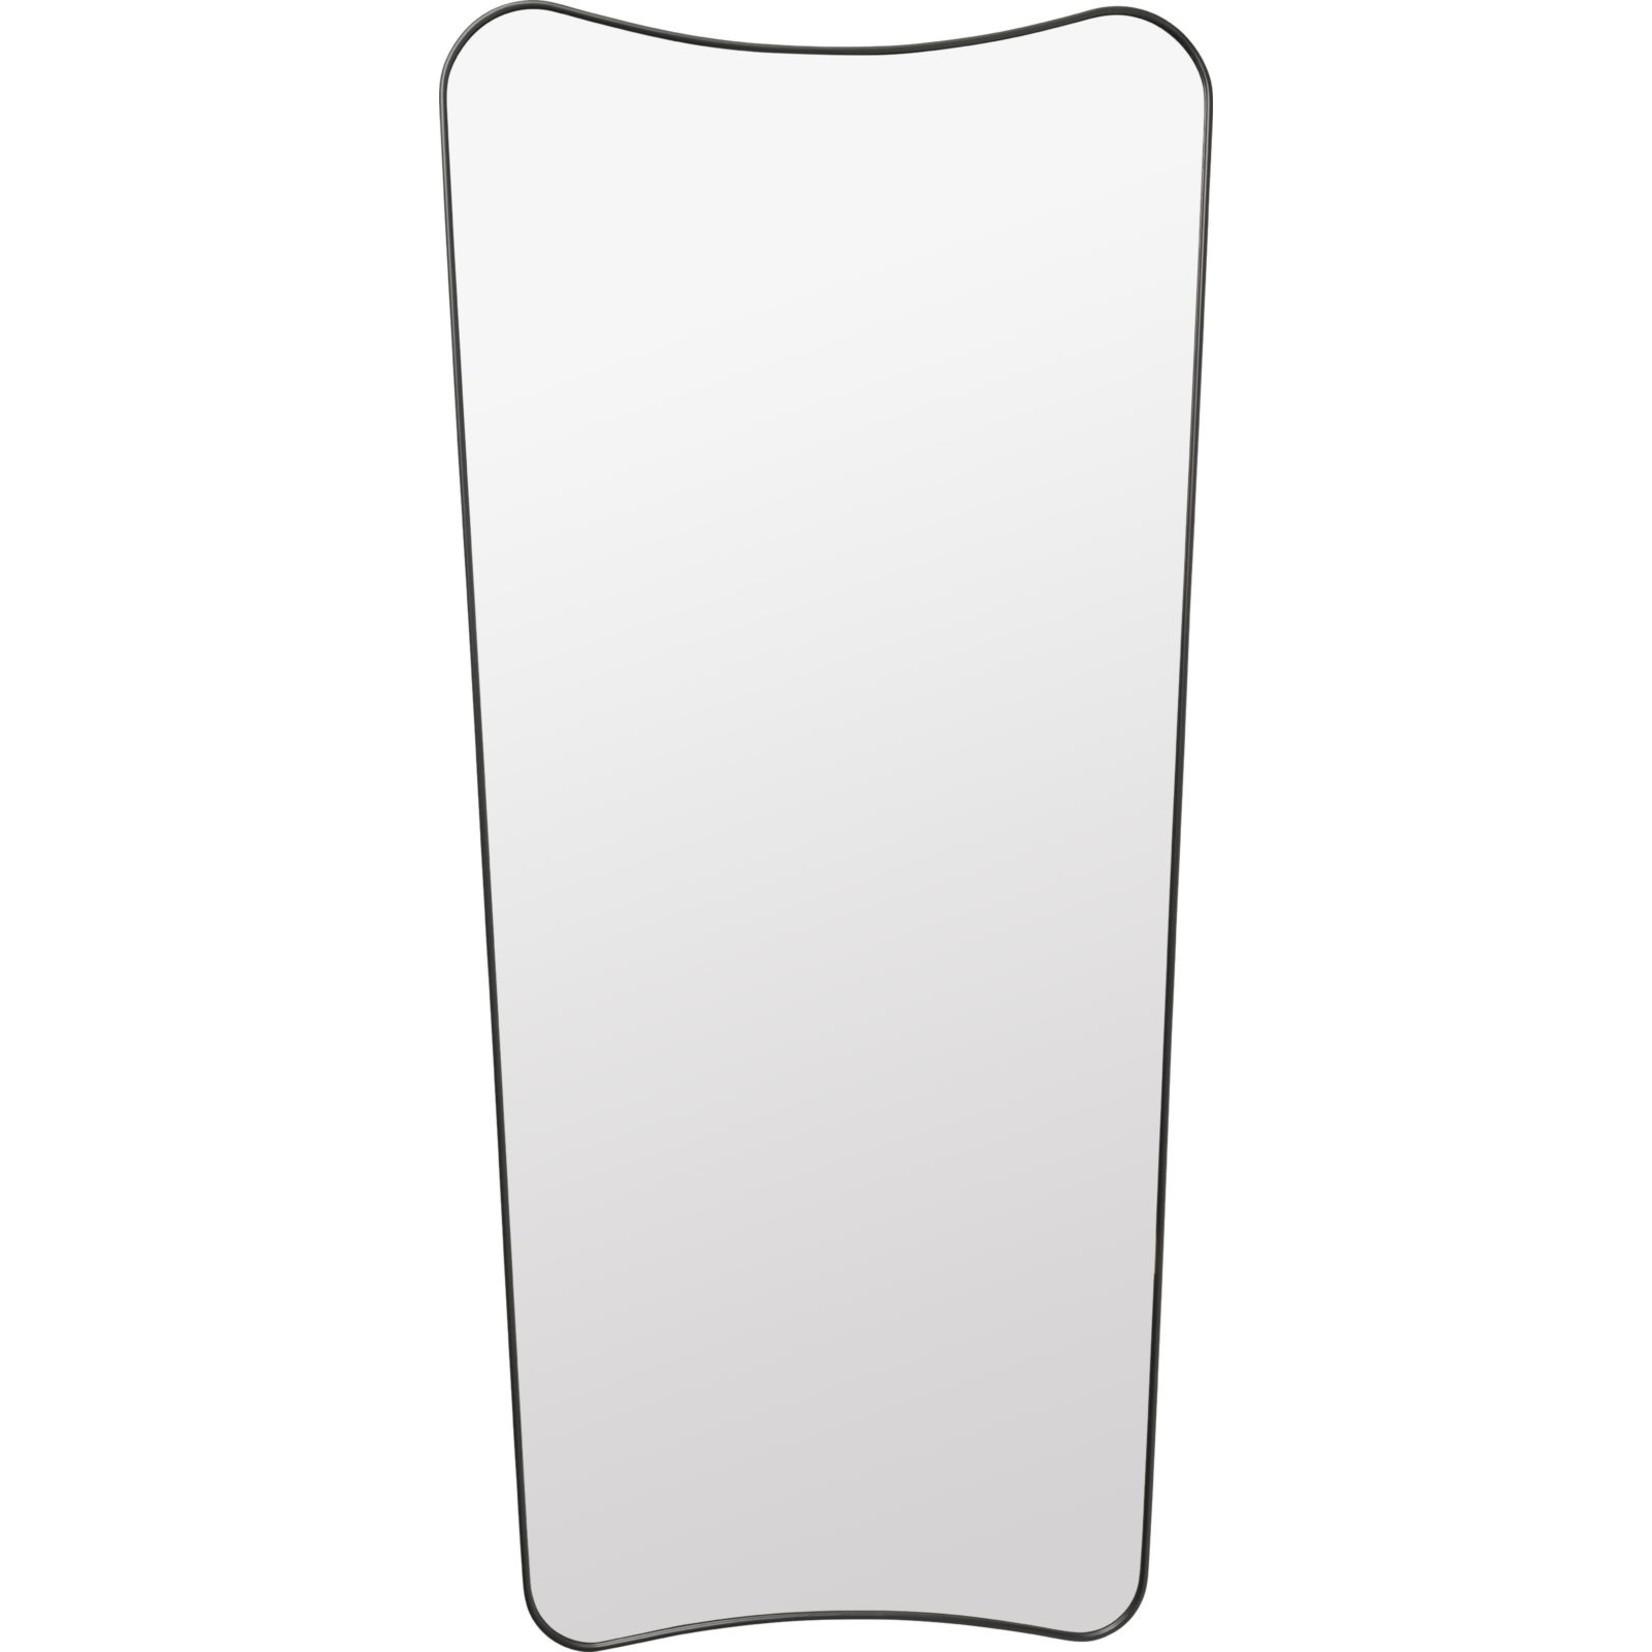 Gubi Wall mirror FA 33 - 69x146 - Black Brass